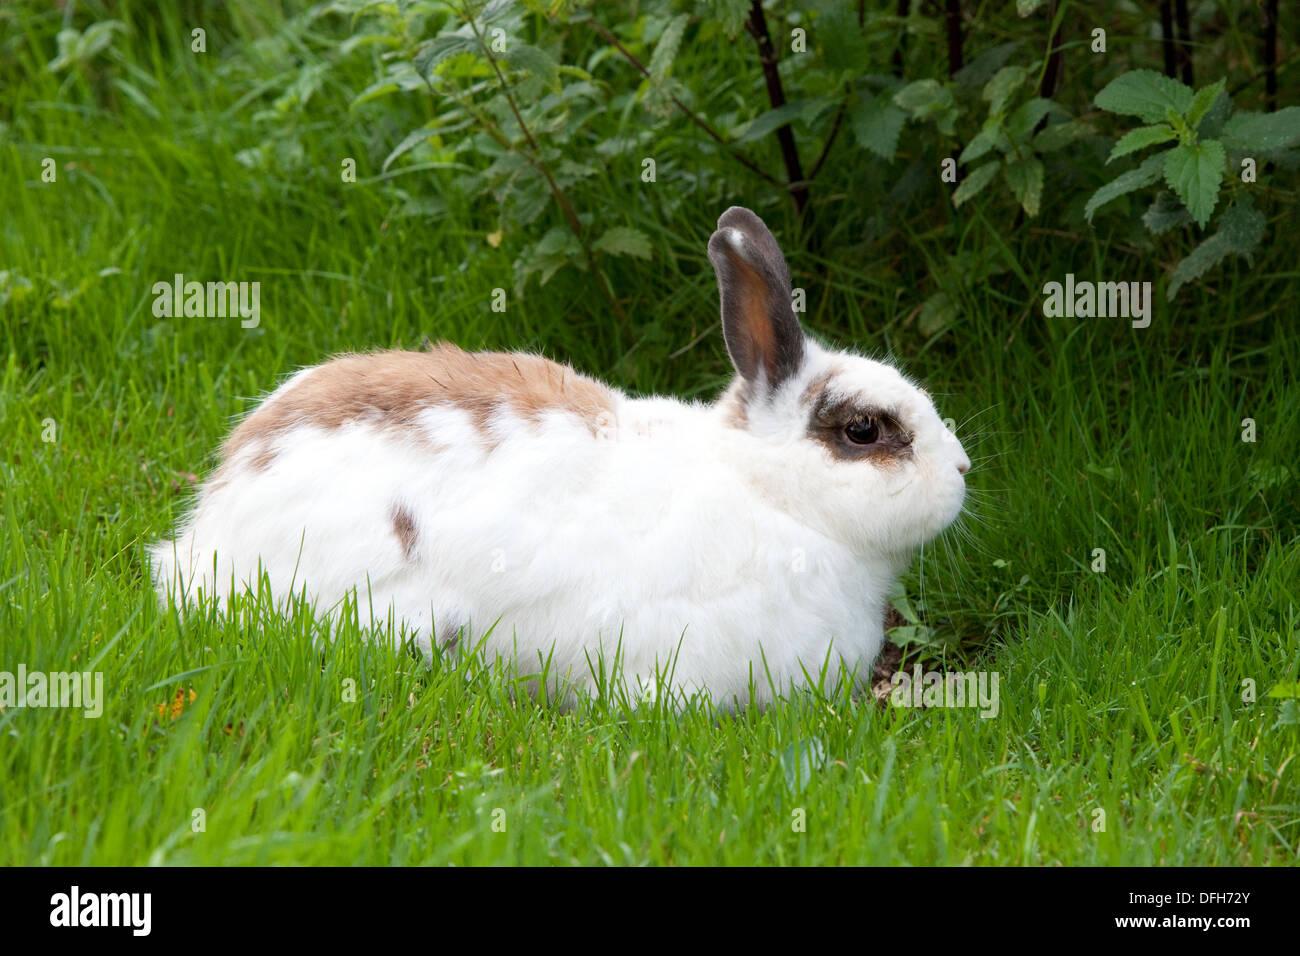 A pet rabbit enjoys the long grass and freedom of a Devon, UK, garden. - Stock Image